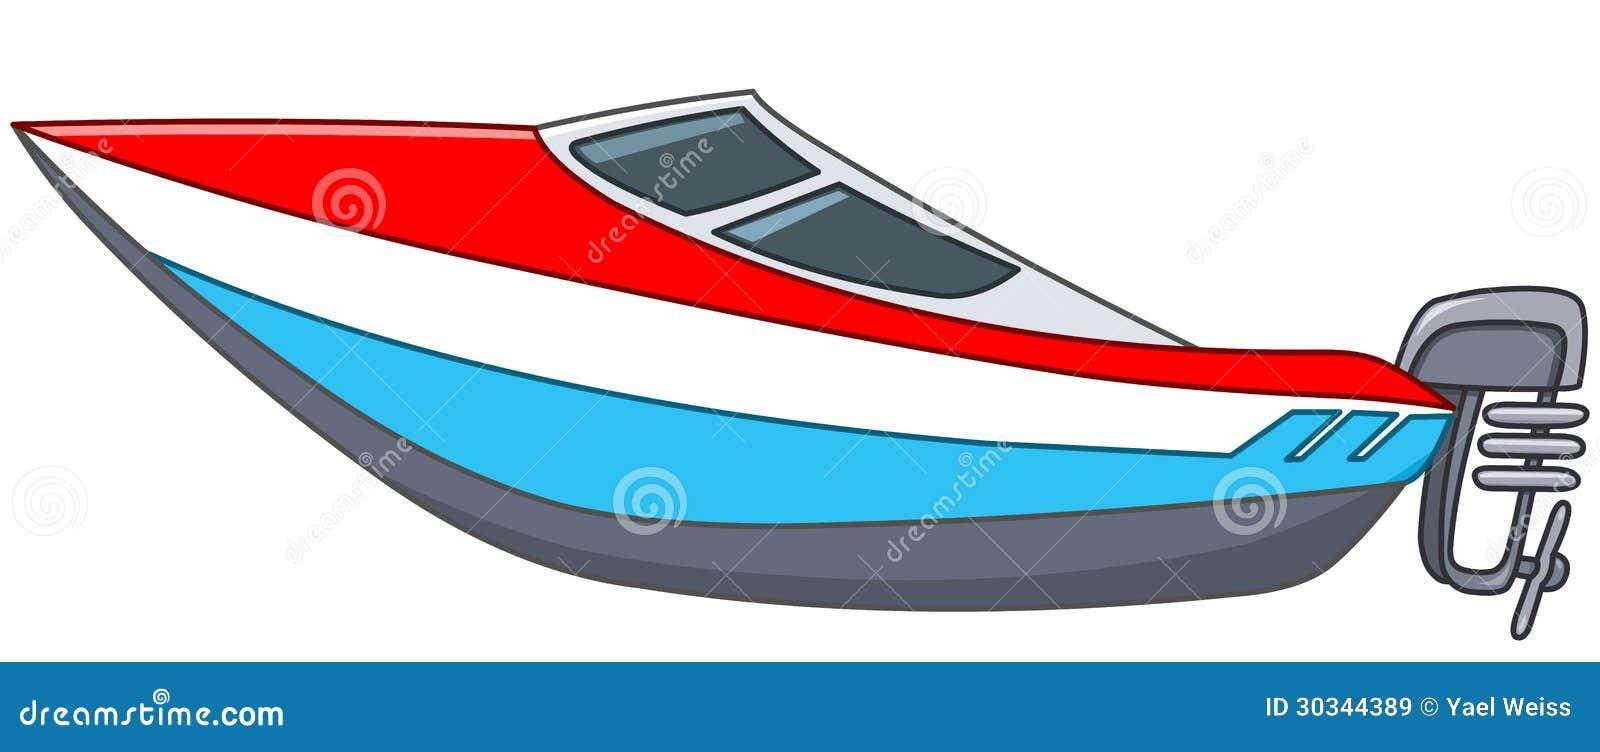 Cartoon Motorboat Royalty Free Stock Images - Image: 30344389